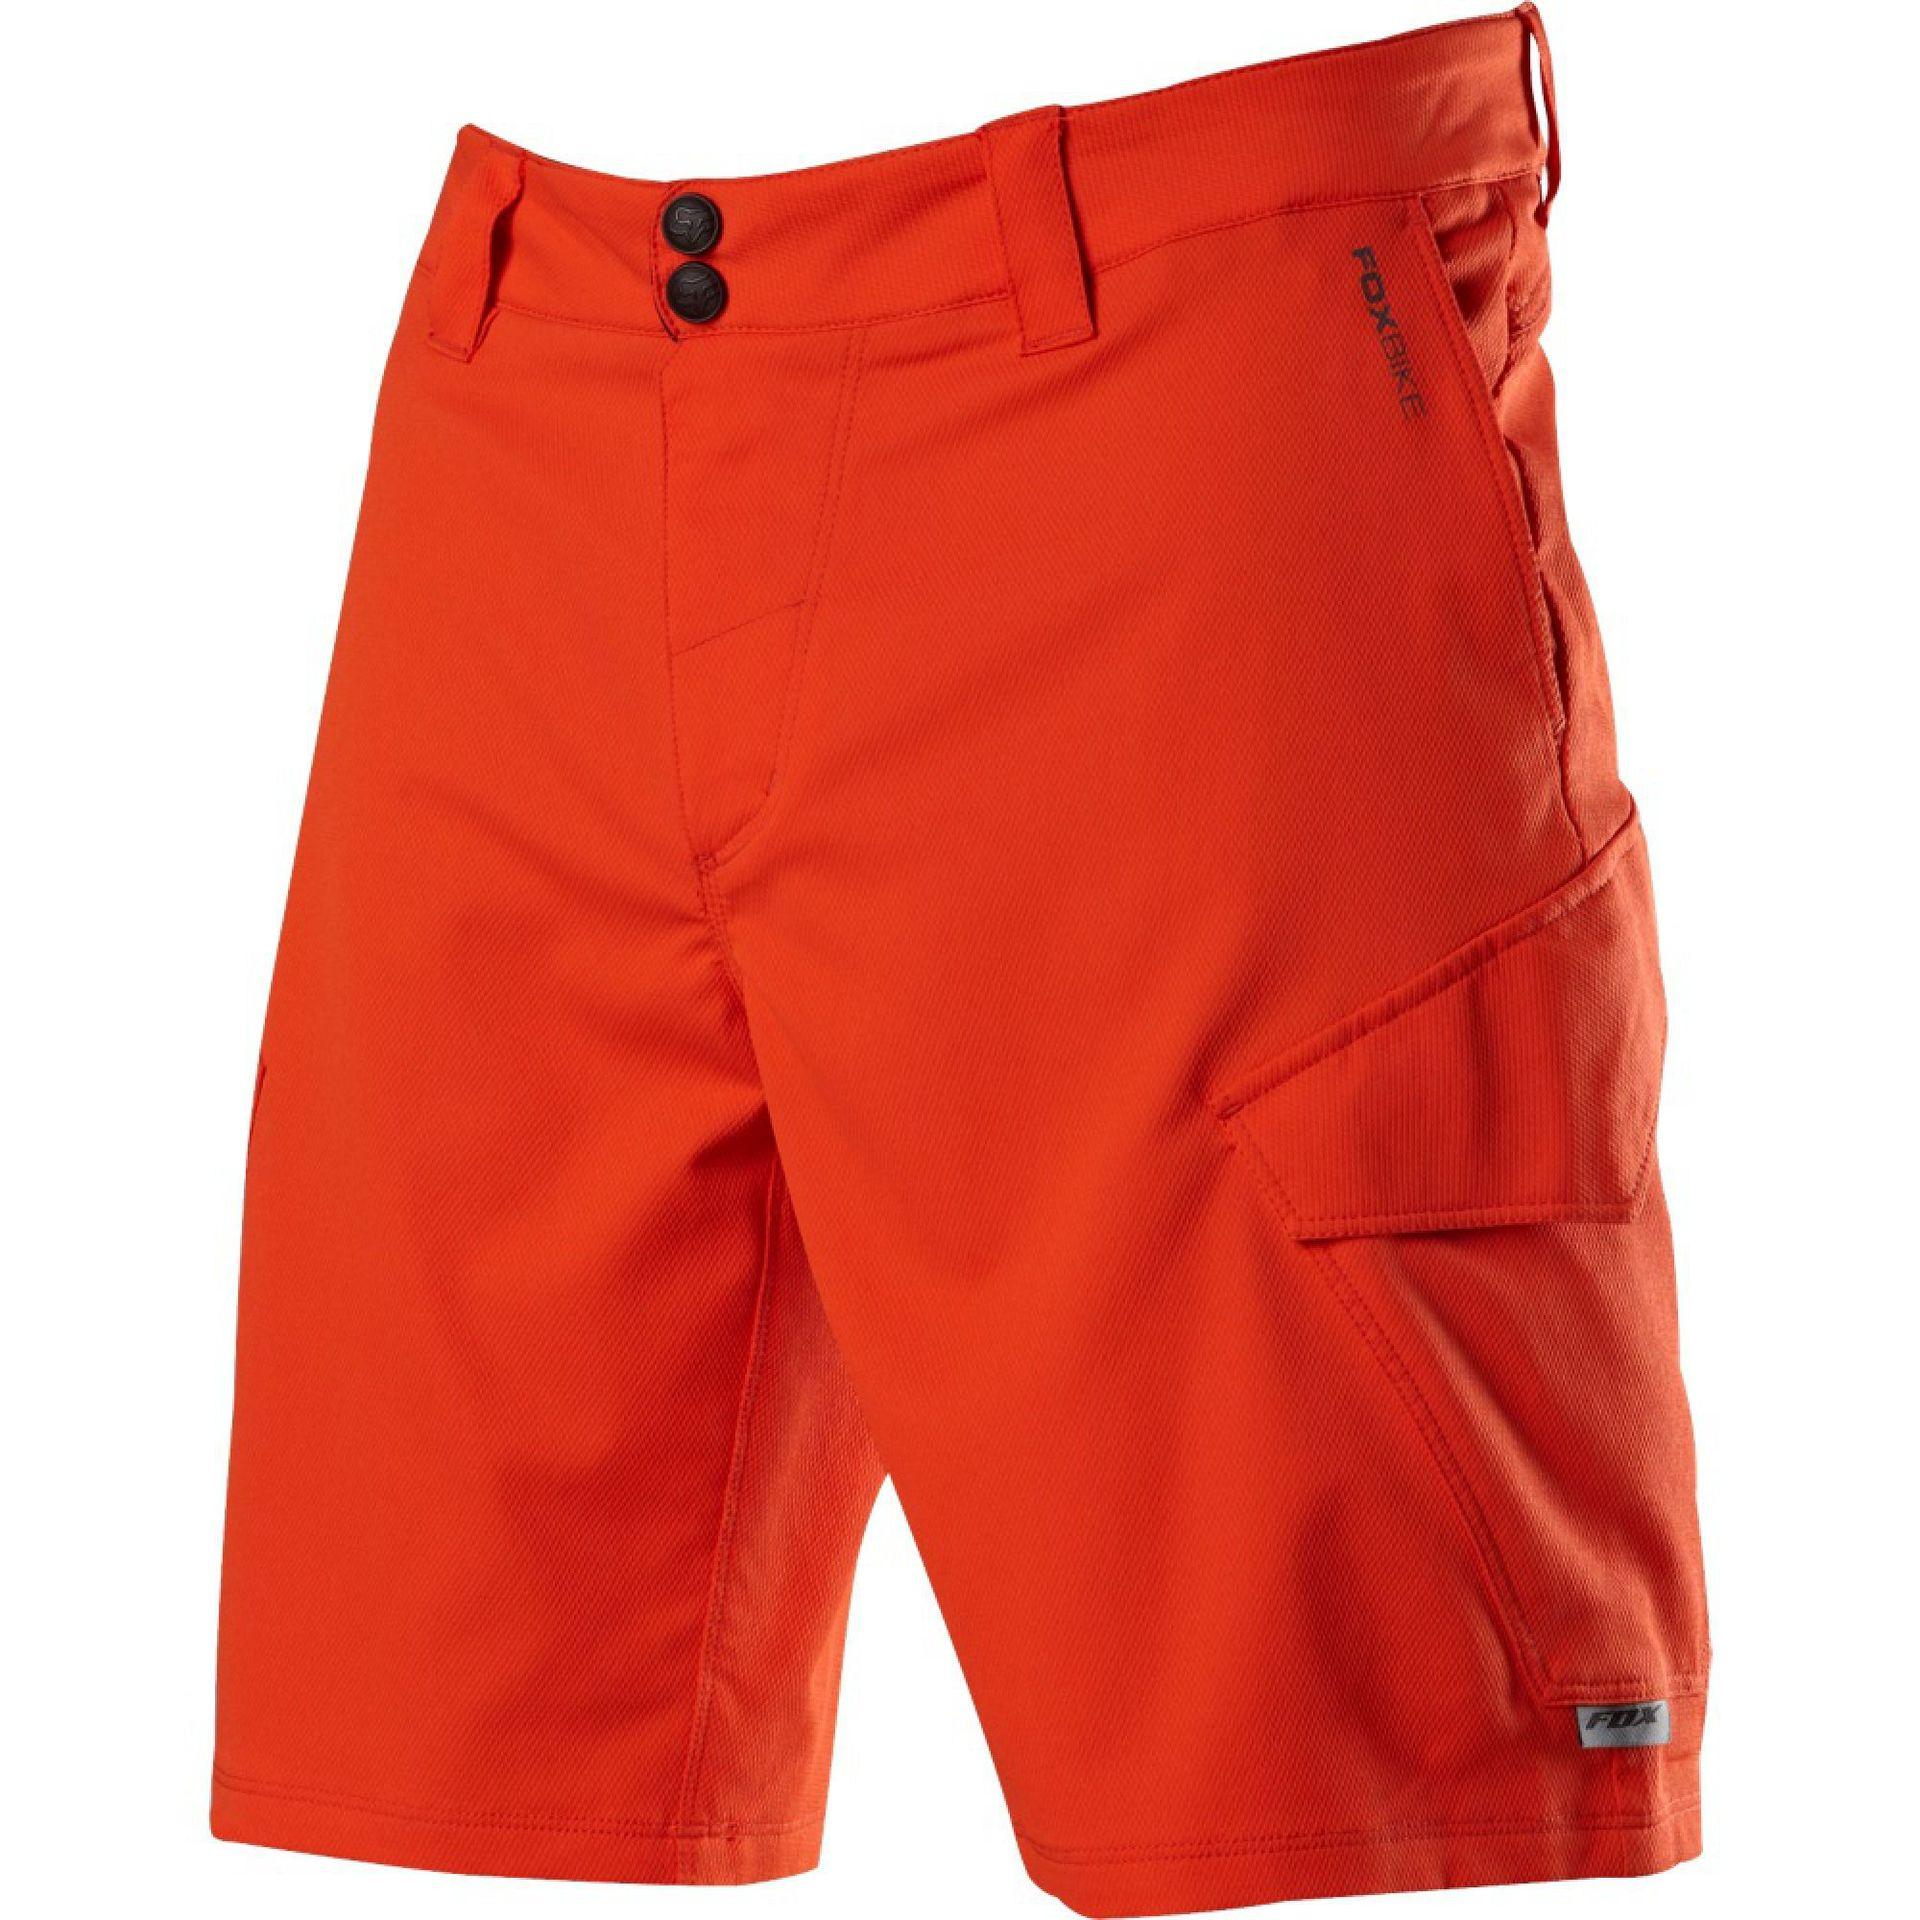 Spodenki Foxhead Ranger Cargo Short pomarańczowe